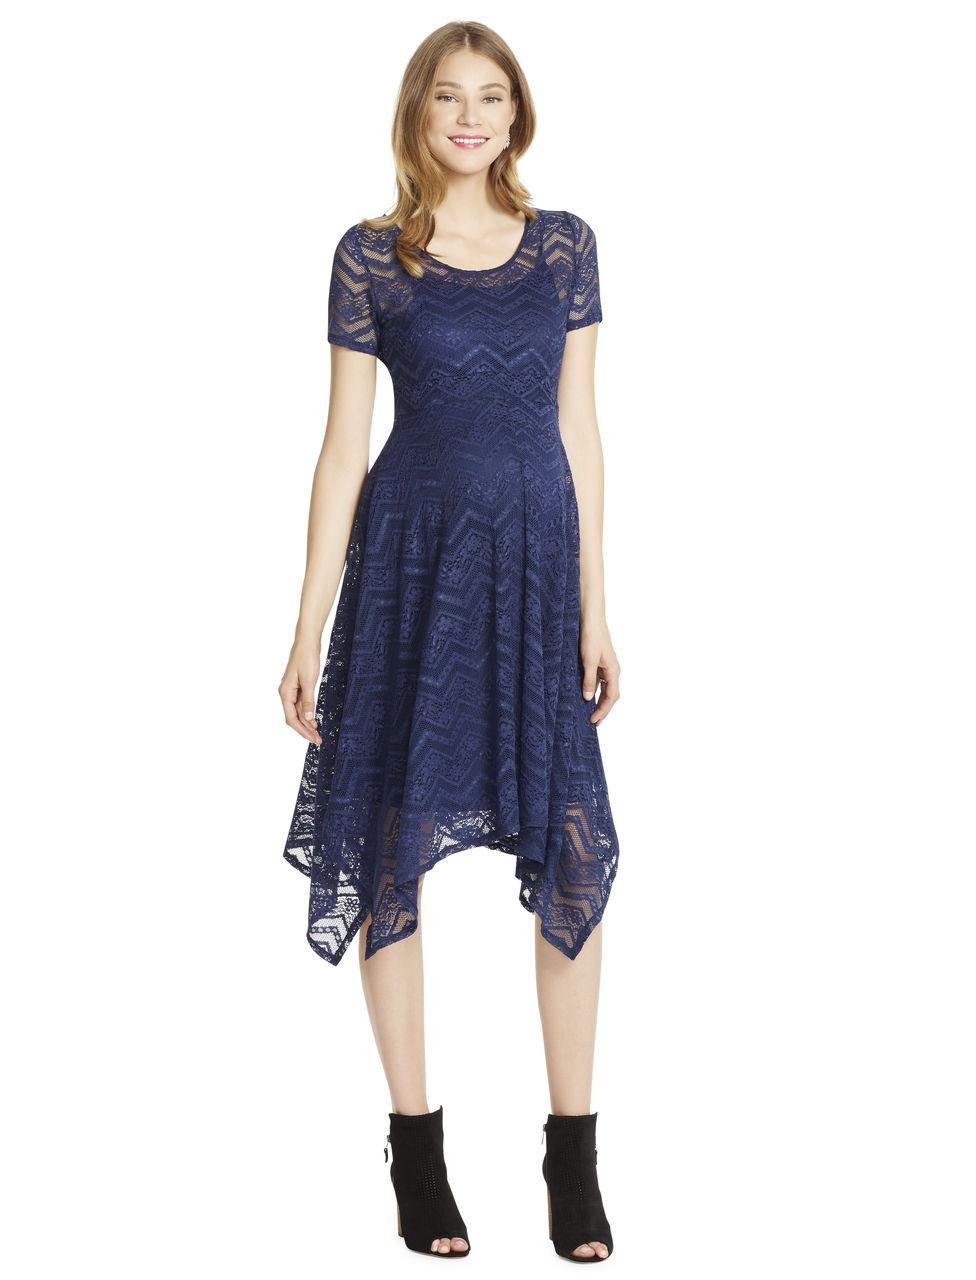 9090c98672cf Jessica Simpson Lace Hanky Hem Maternity Dress. Price: ₱2,000. Image 1